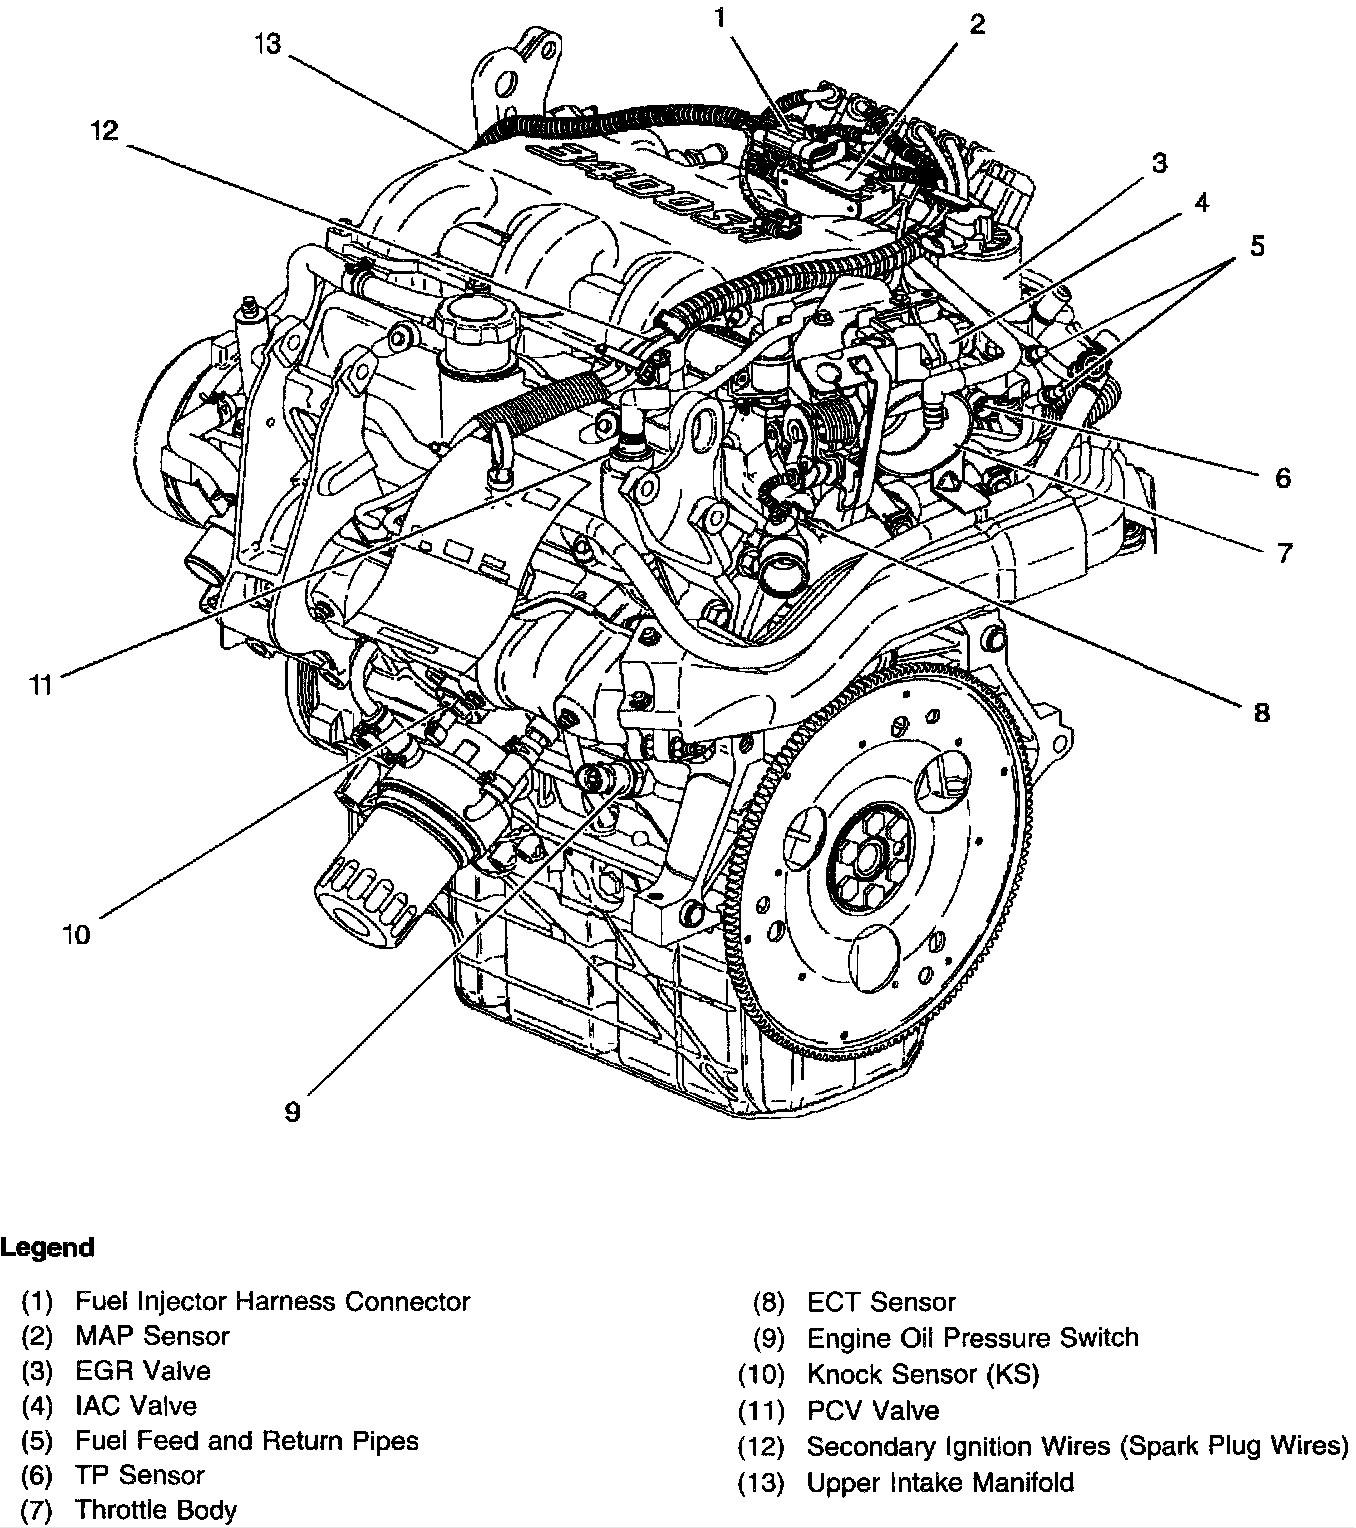 hight resolution of 3400 v6 dohc engine diagram wiring diagram 3400 v6 dohc engine diagram